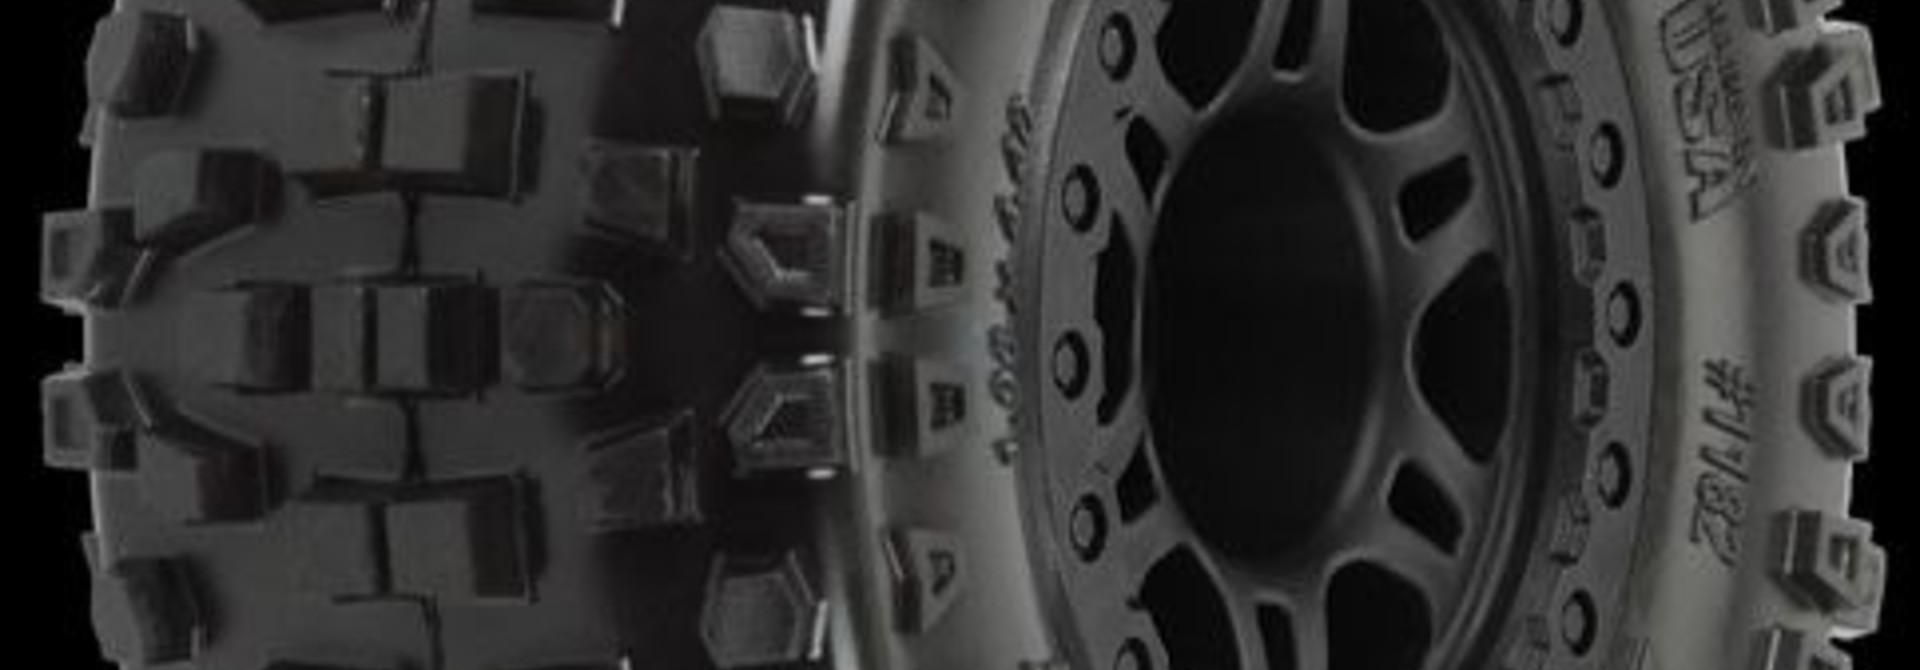 Badlands SC 2.2/3.0 M2 (Medium) Tires Mounted on Split Six B, PR1182-21